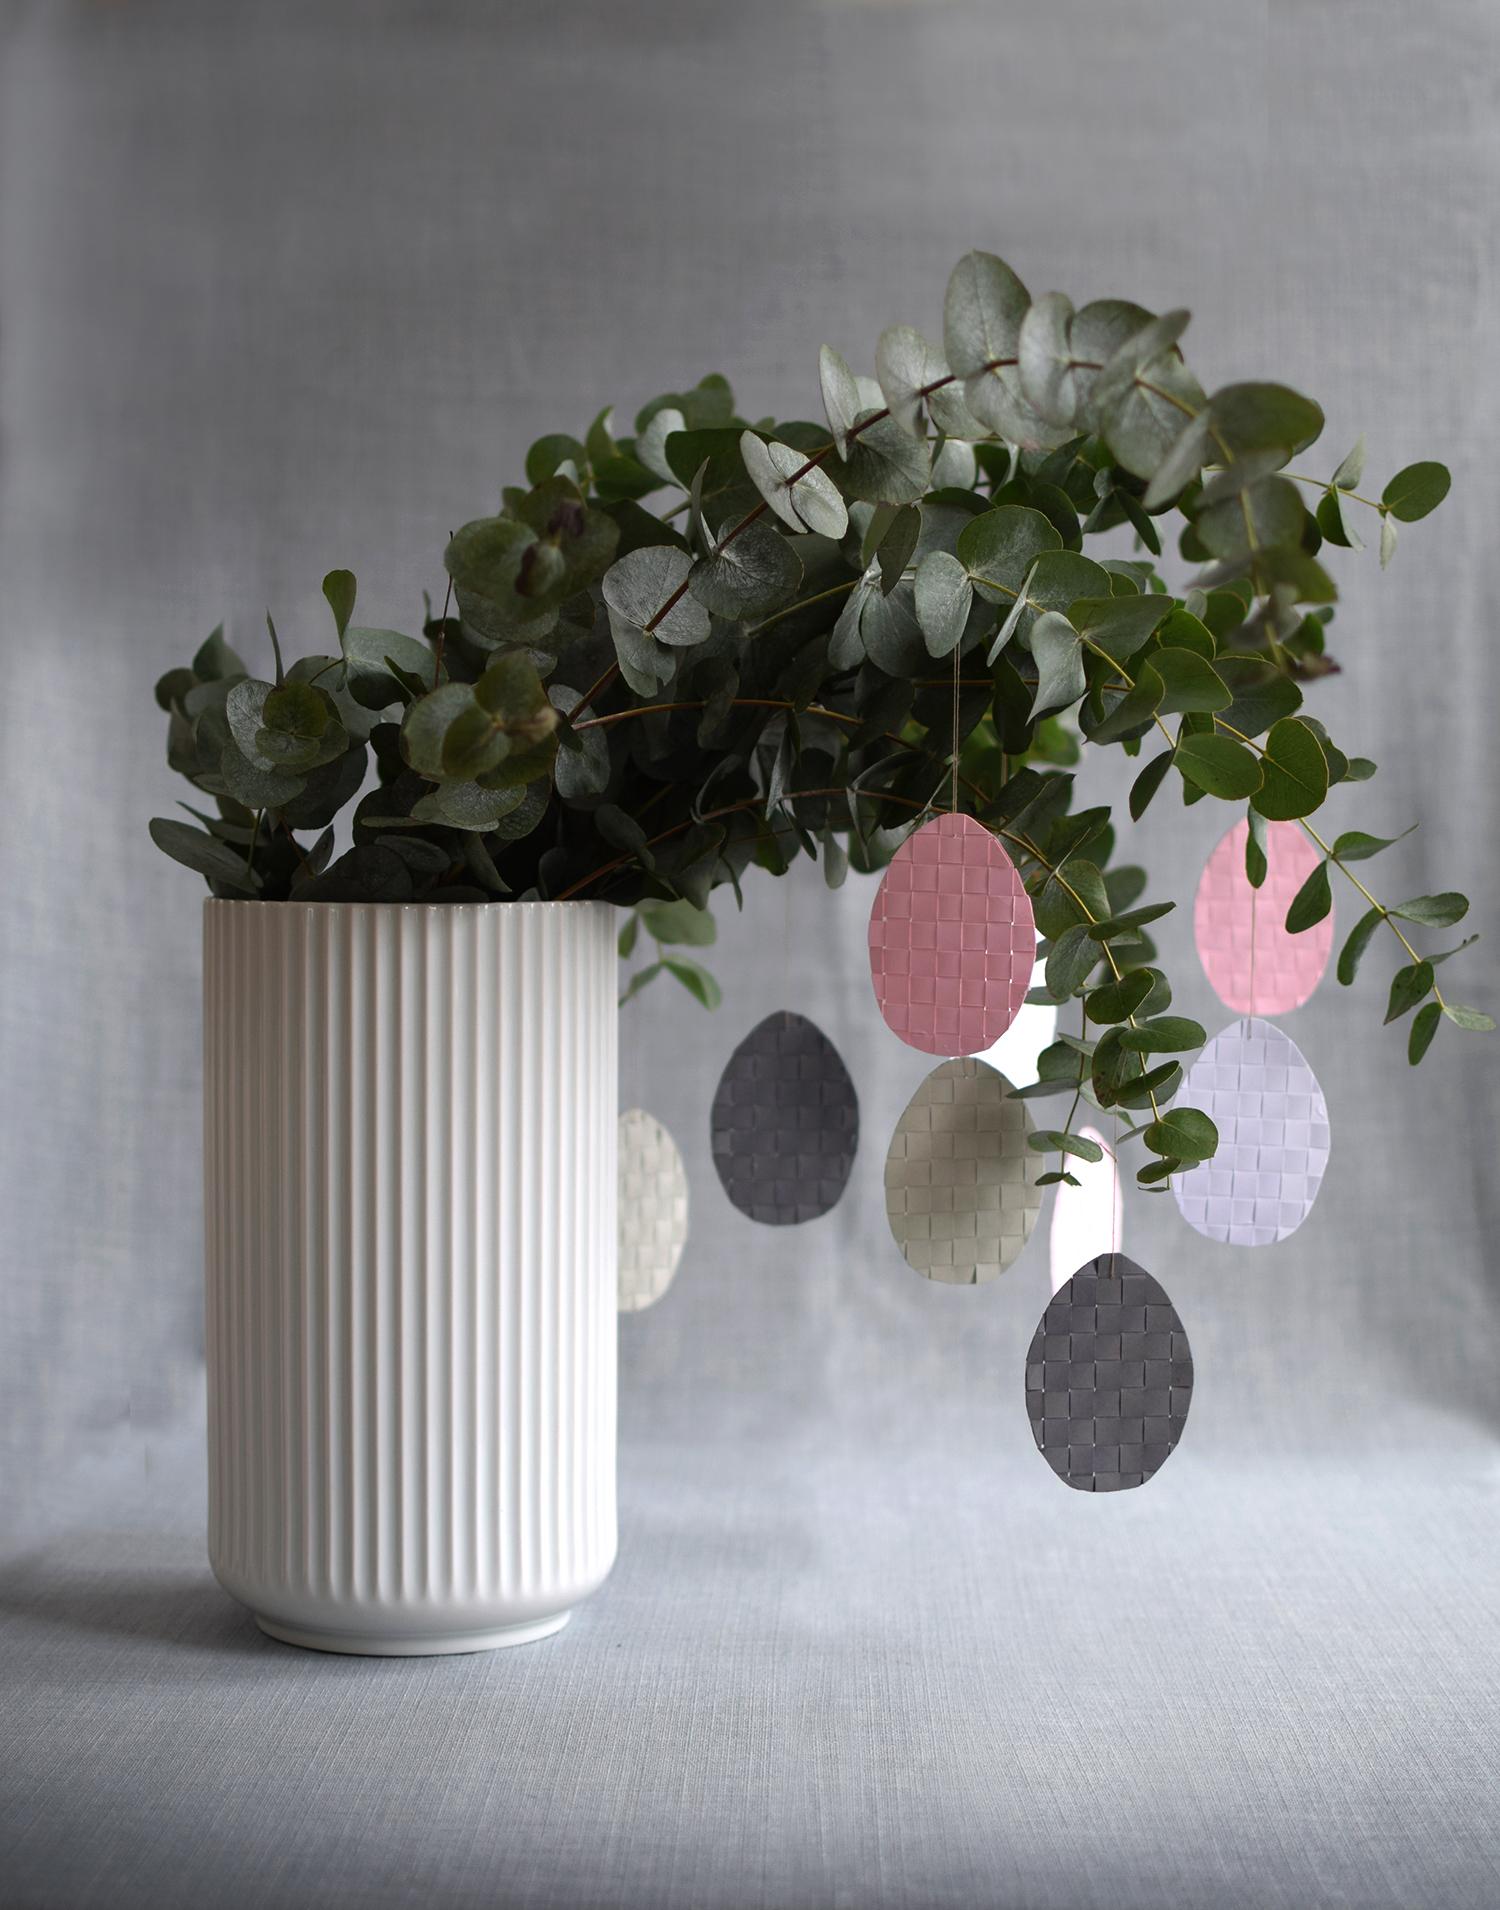 DIY pastel interwoven Easter egg ornaments